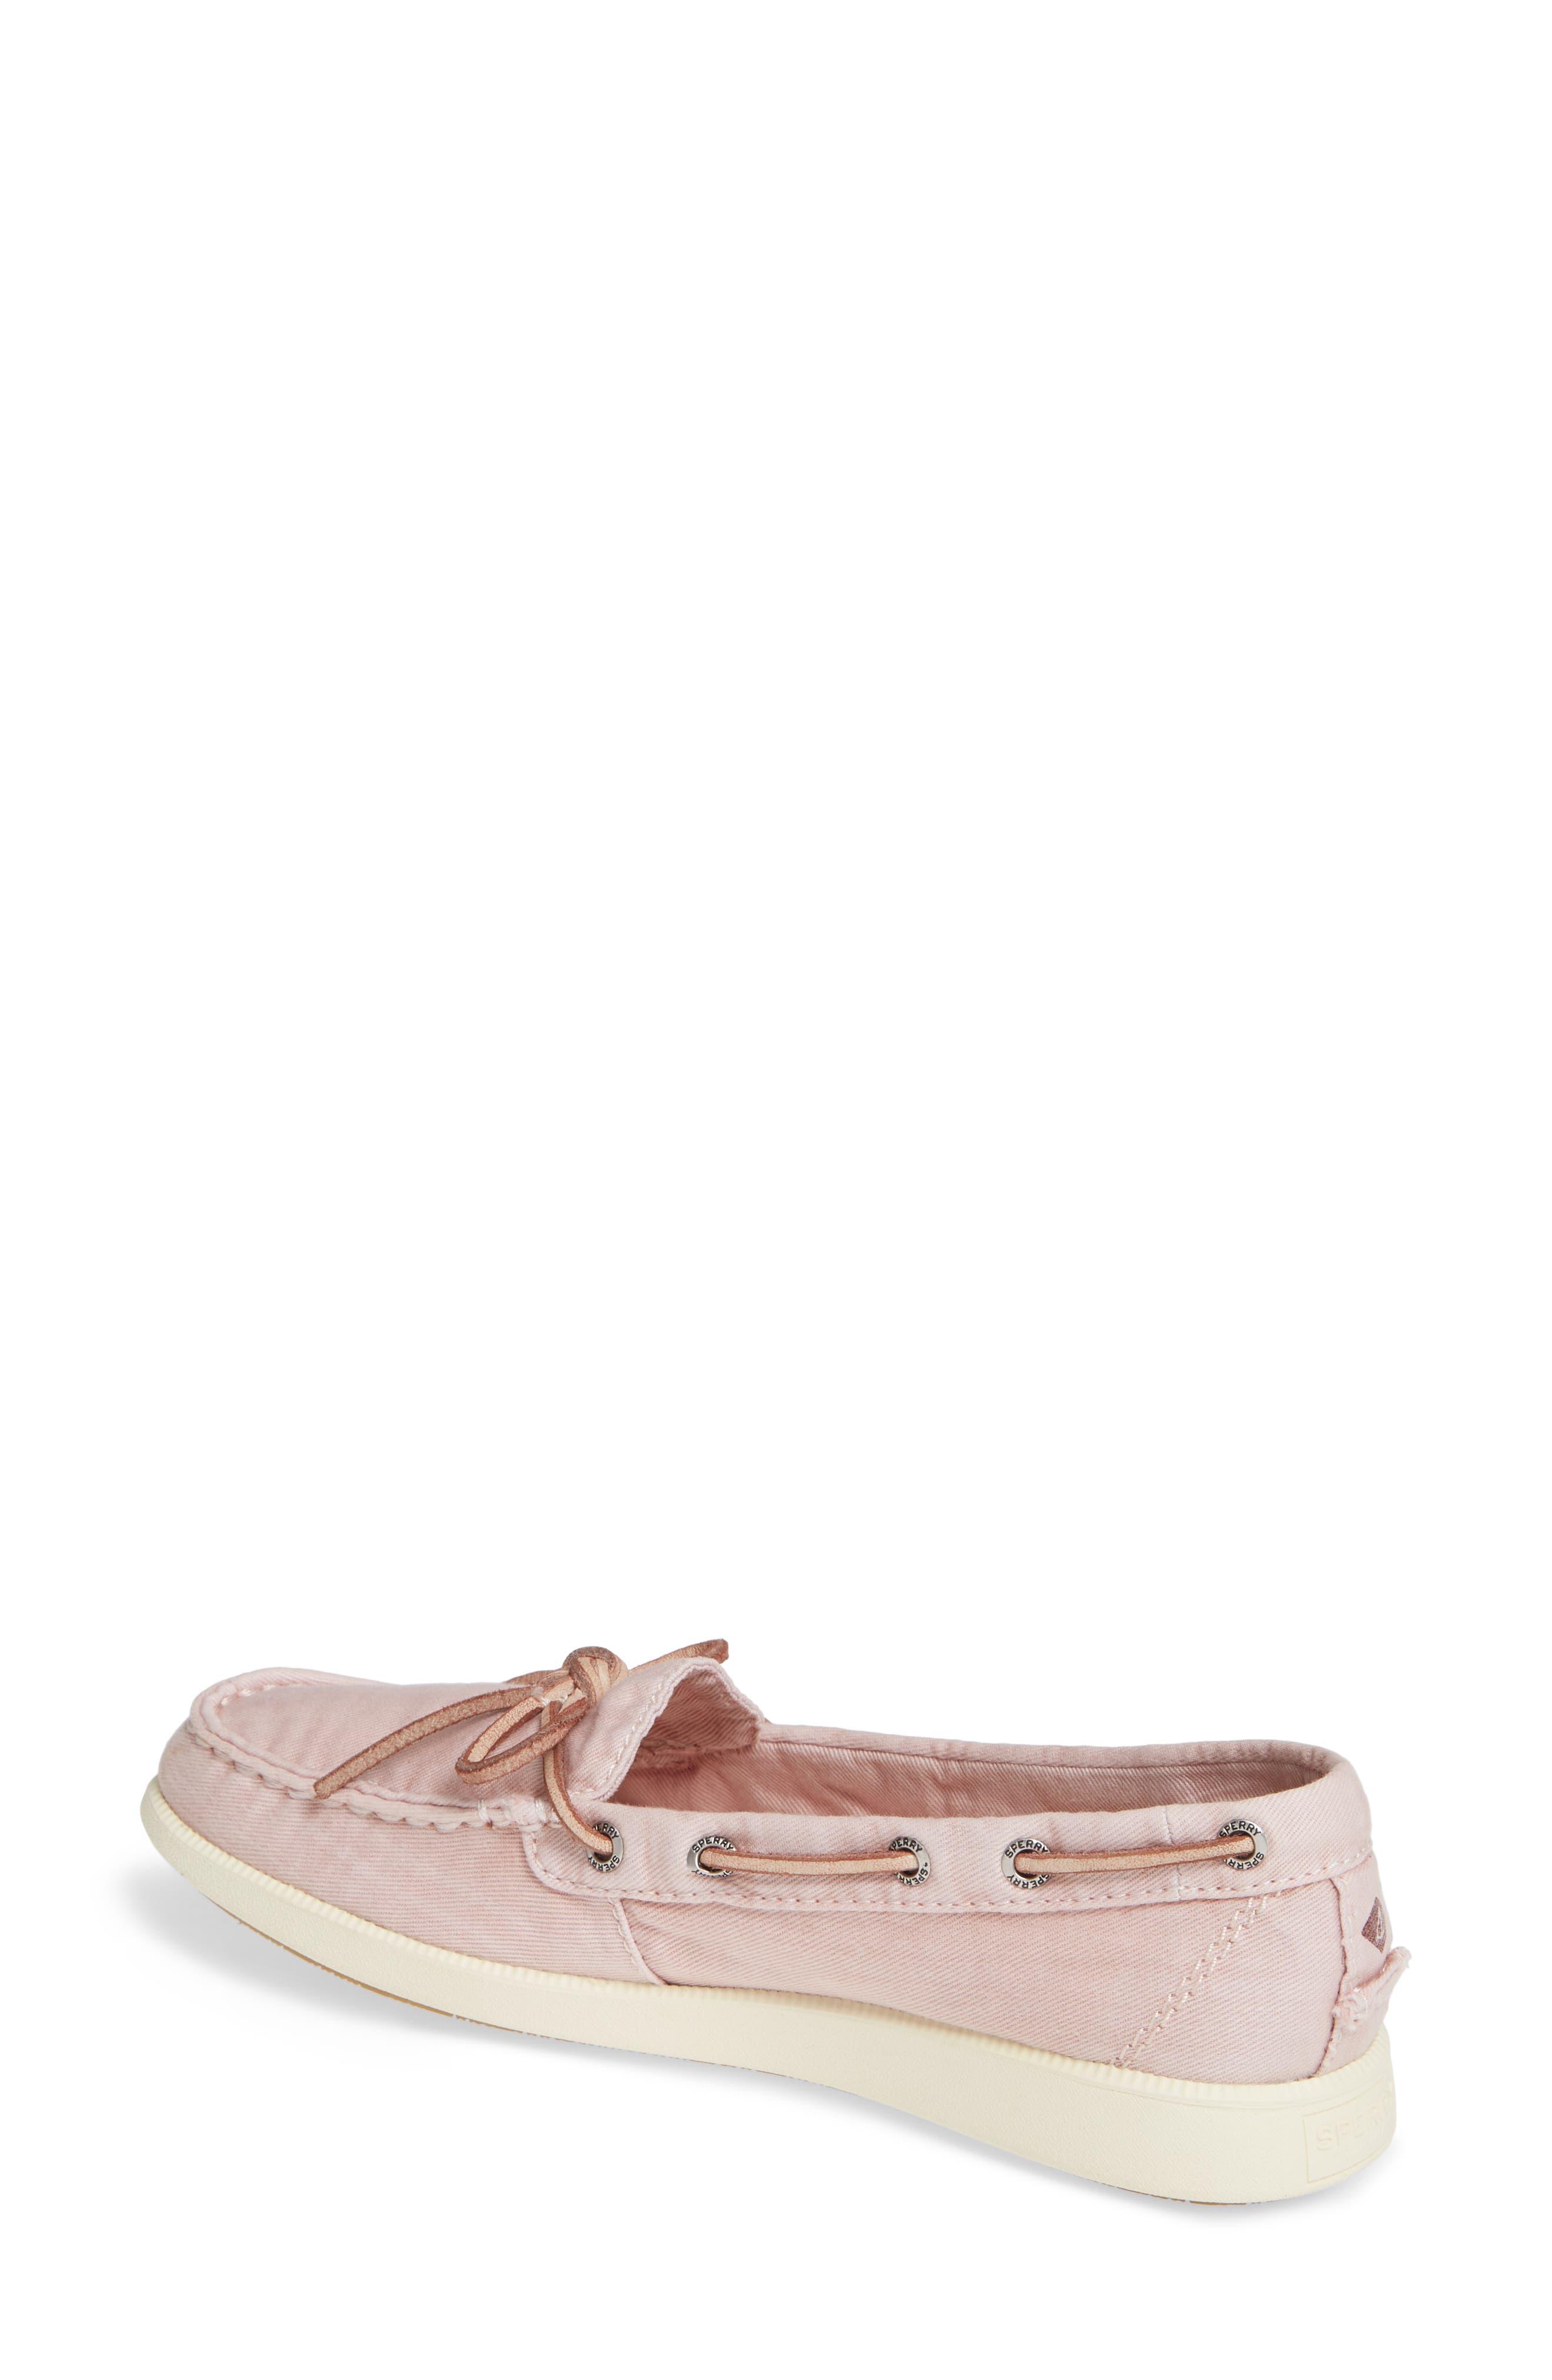 Oasis Boat Shoe,                             Alternate thumbnail 2, color,                             ROSE CANVAS